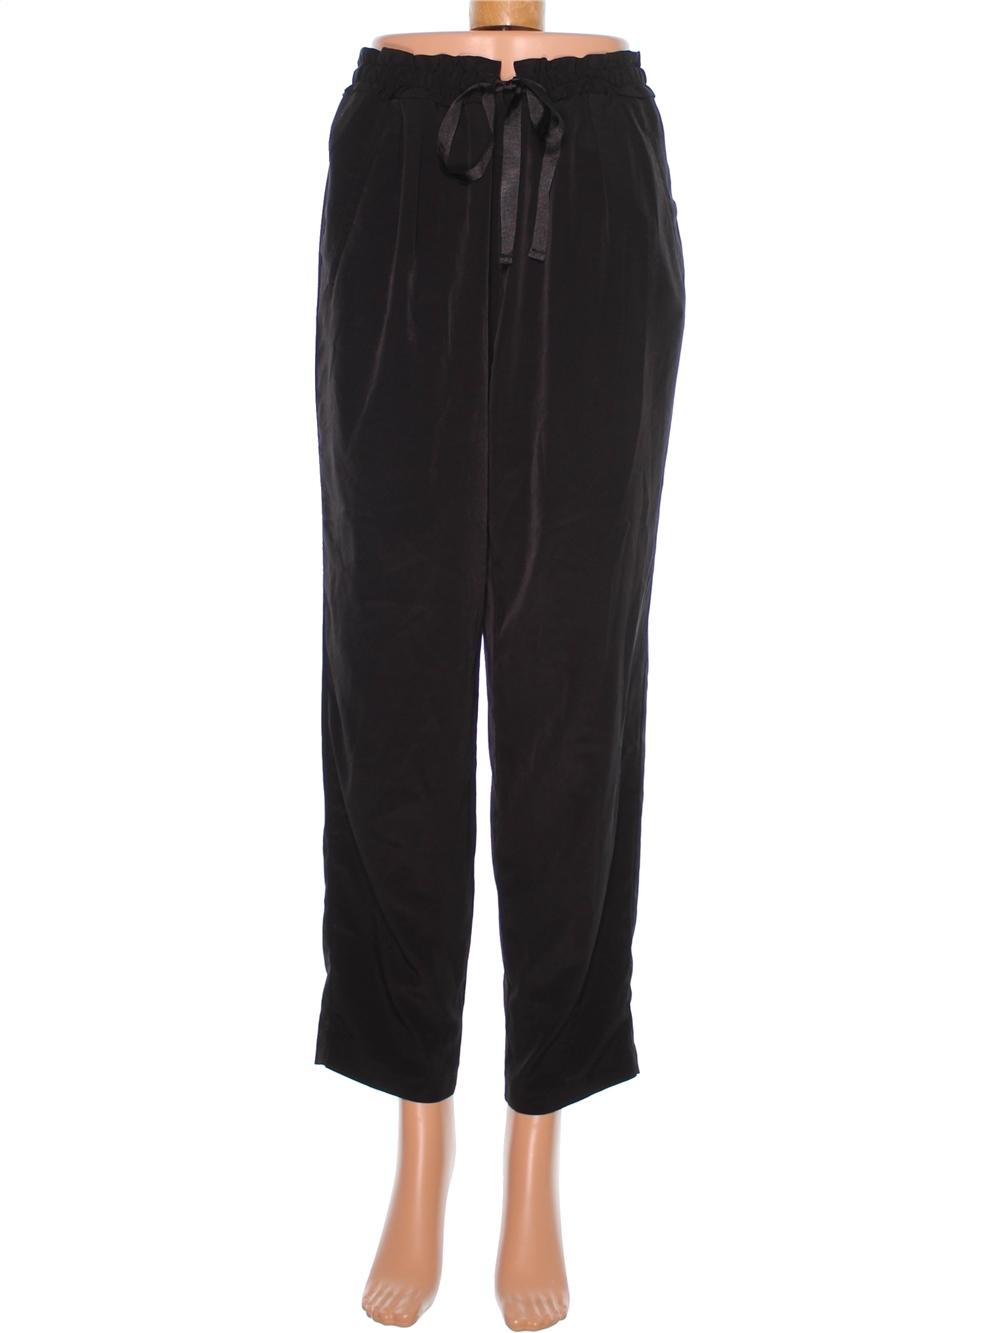 reputable site official shop aliexpress zara pantalon femme